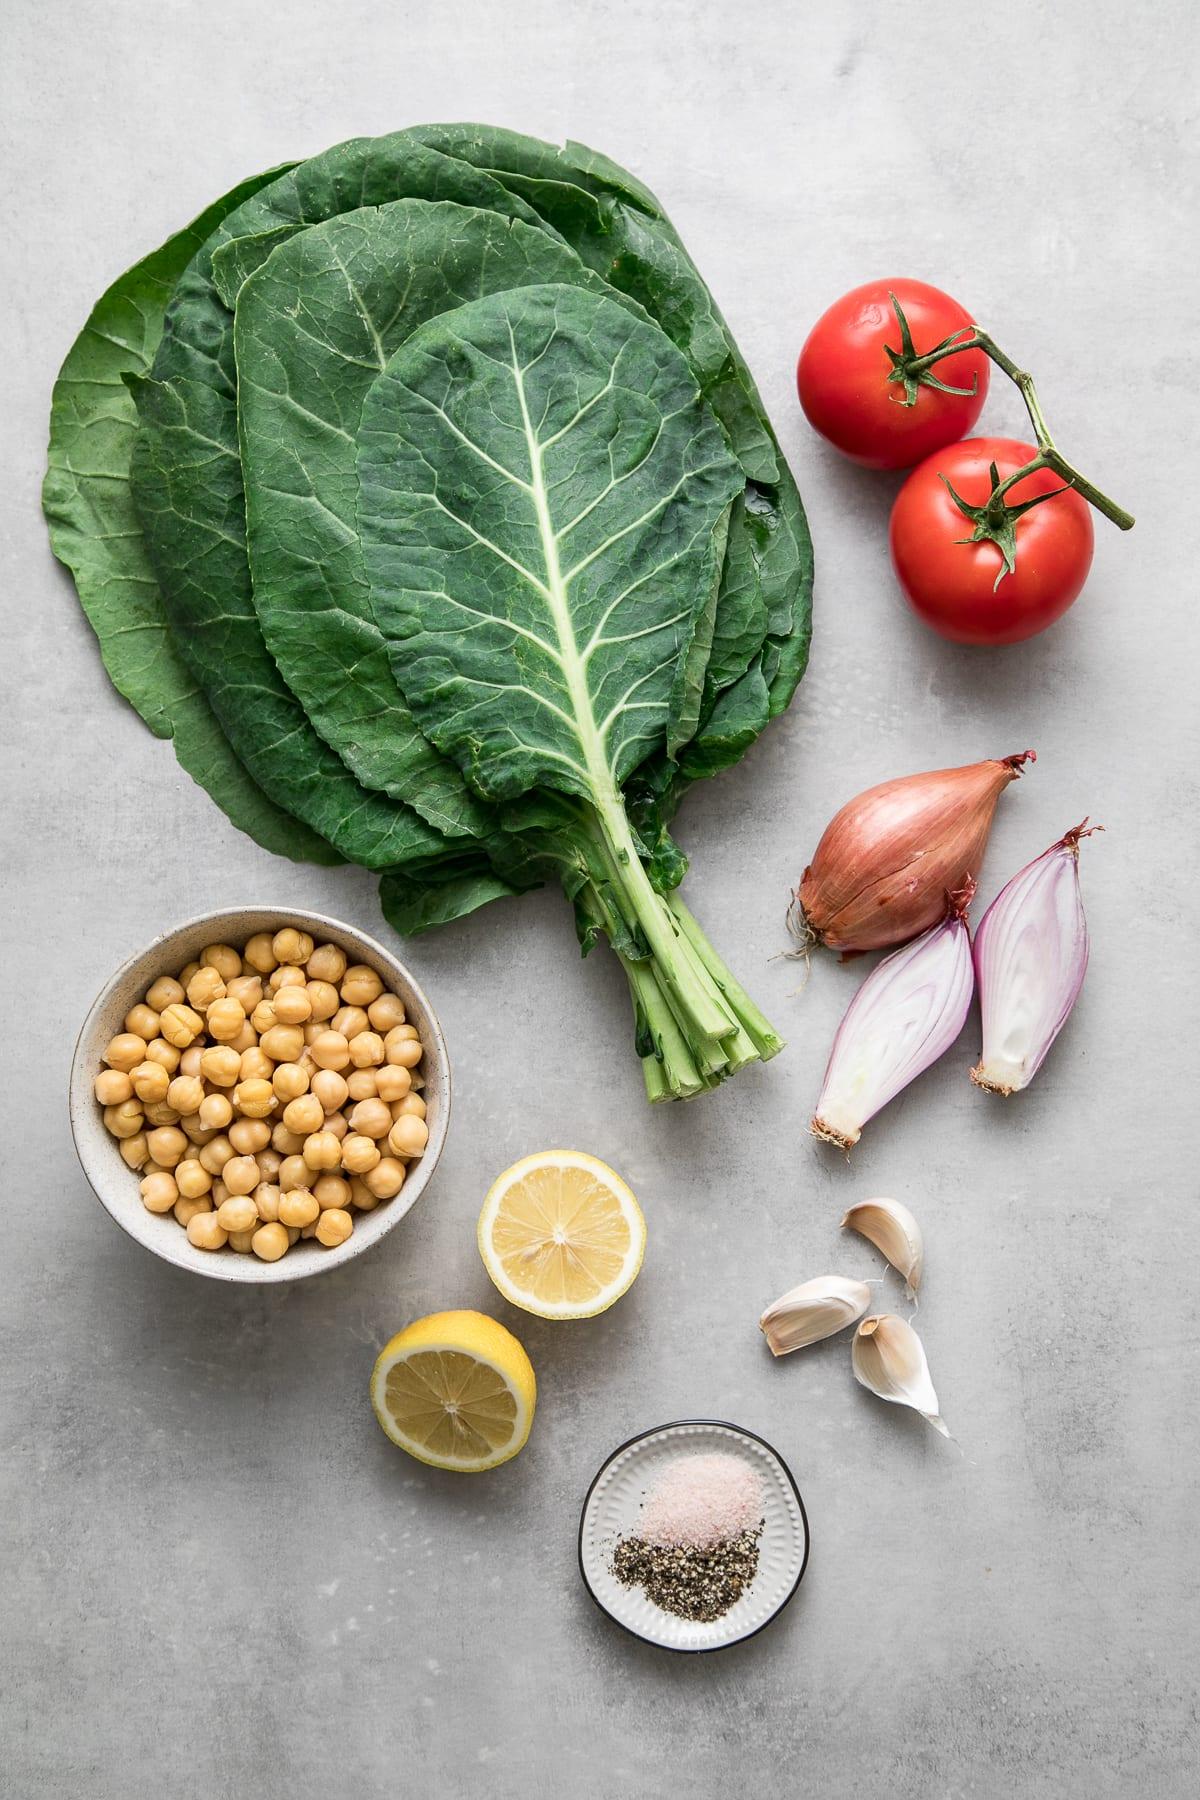 top down view of ingredients used to make vegan collard greens recipe.